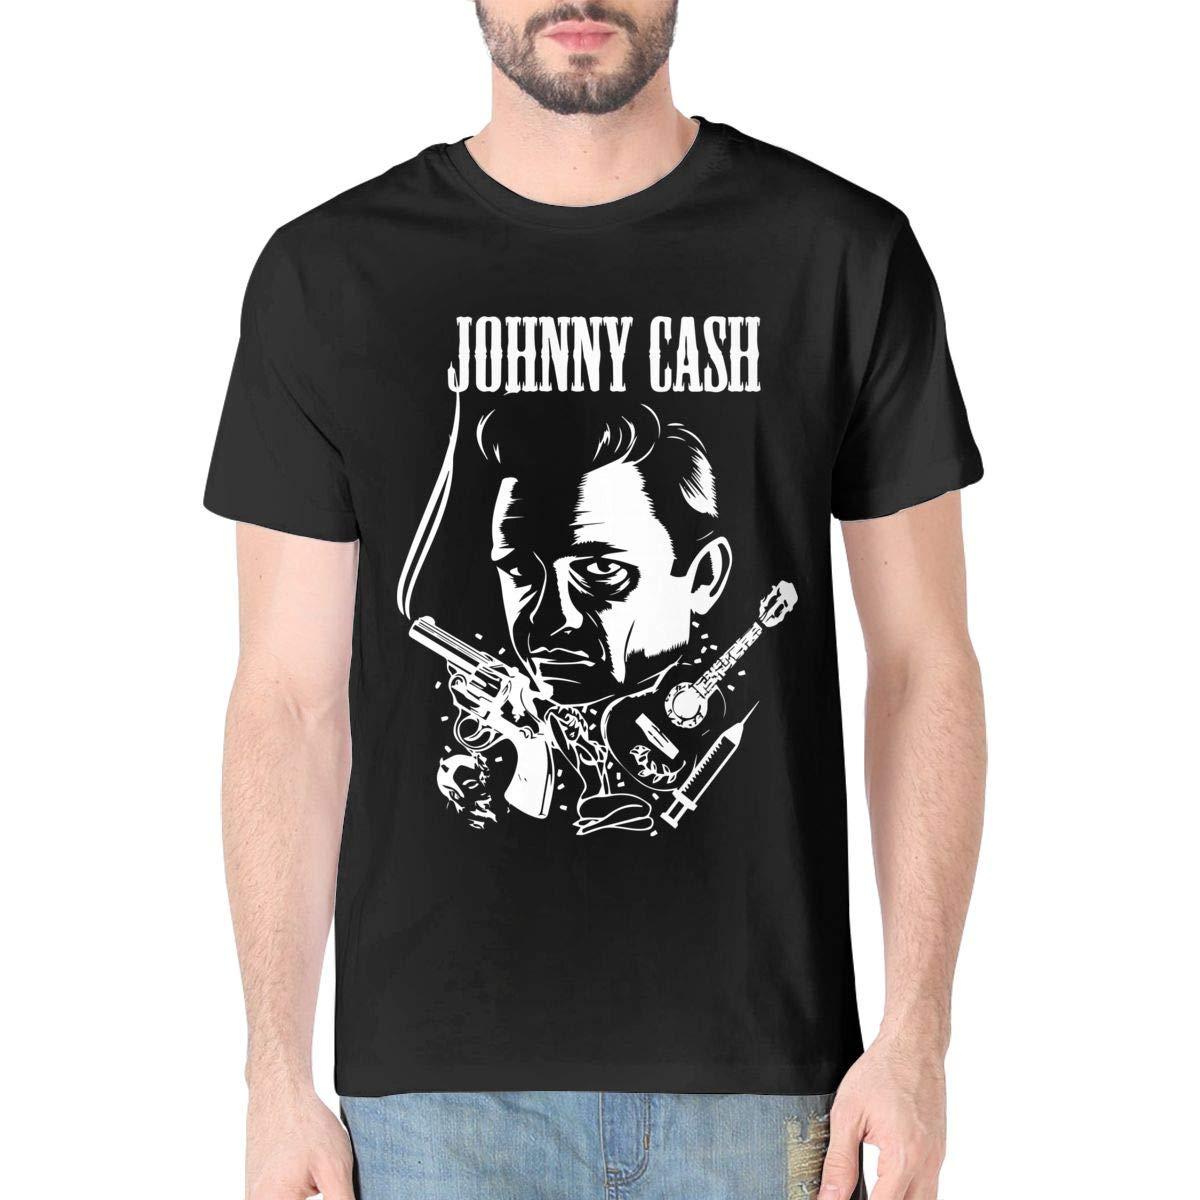 Nagolia Mens Cotton Short Sleeve T Shirt Johnny Cash Adult Crew Neck Tees Top